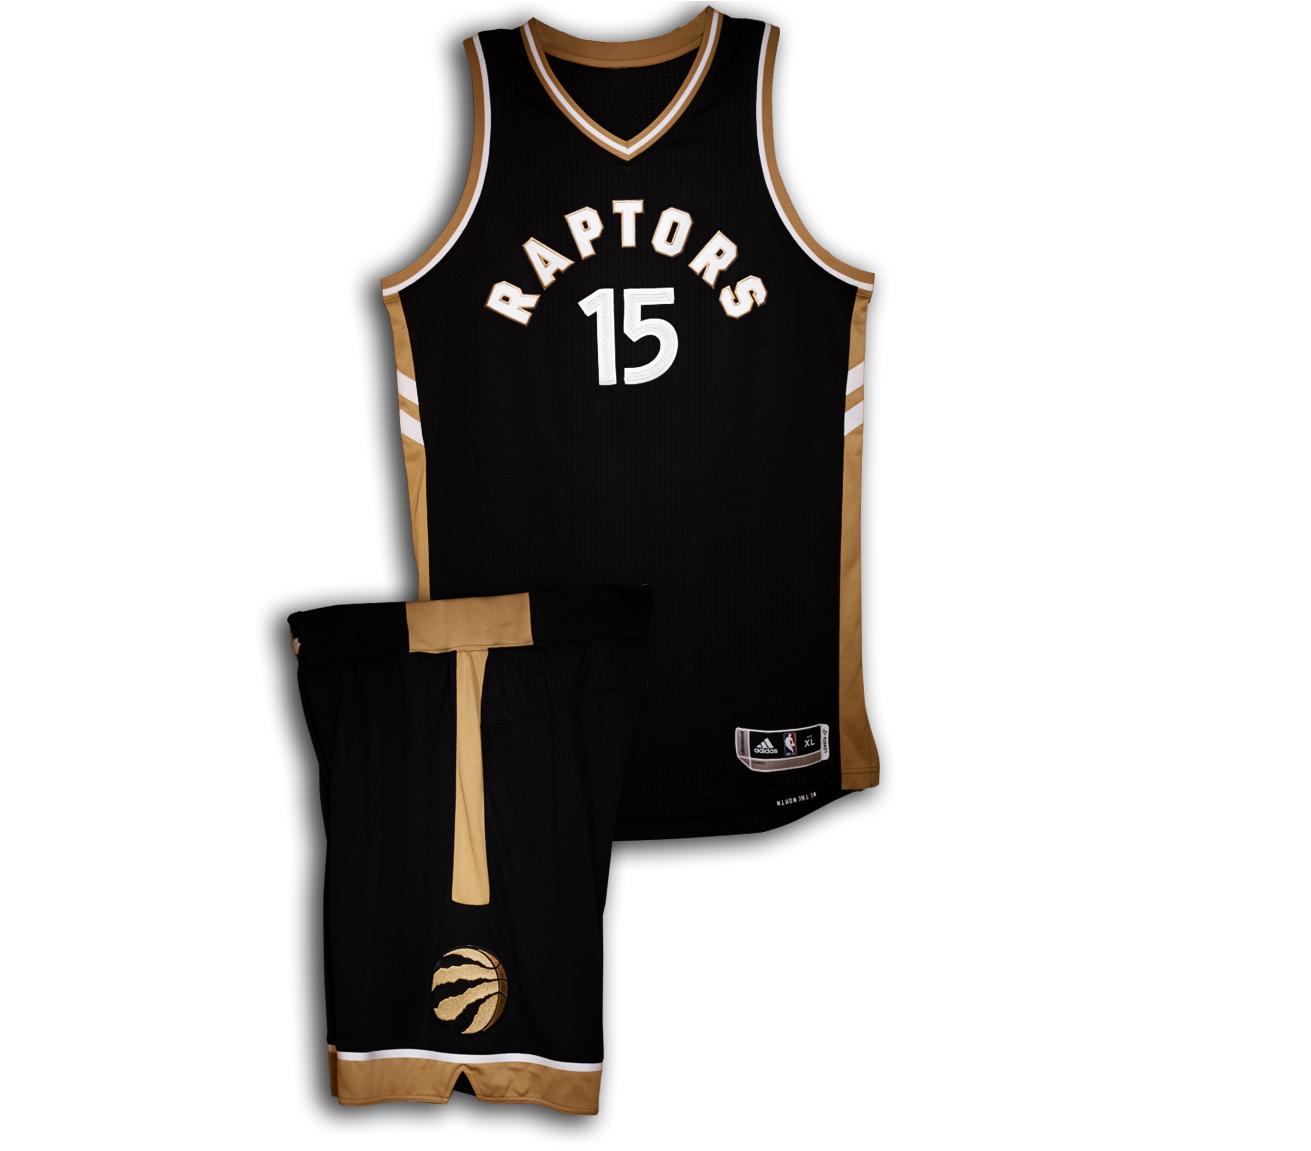 Toronto Raptors - Alternate uniform 2